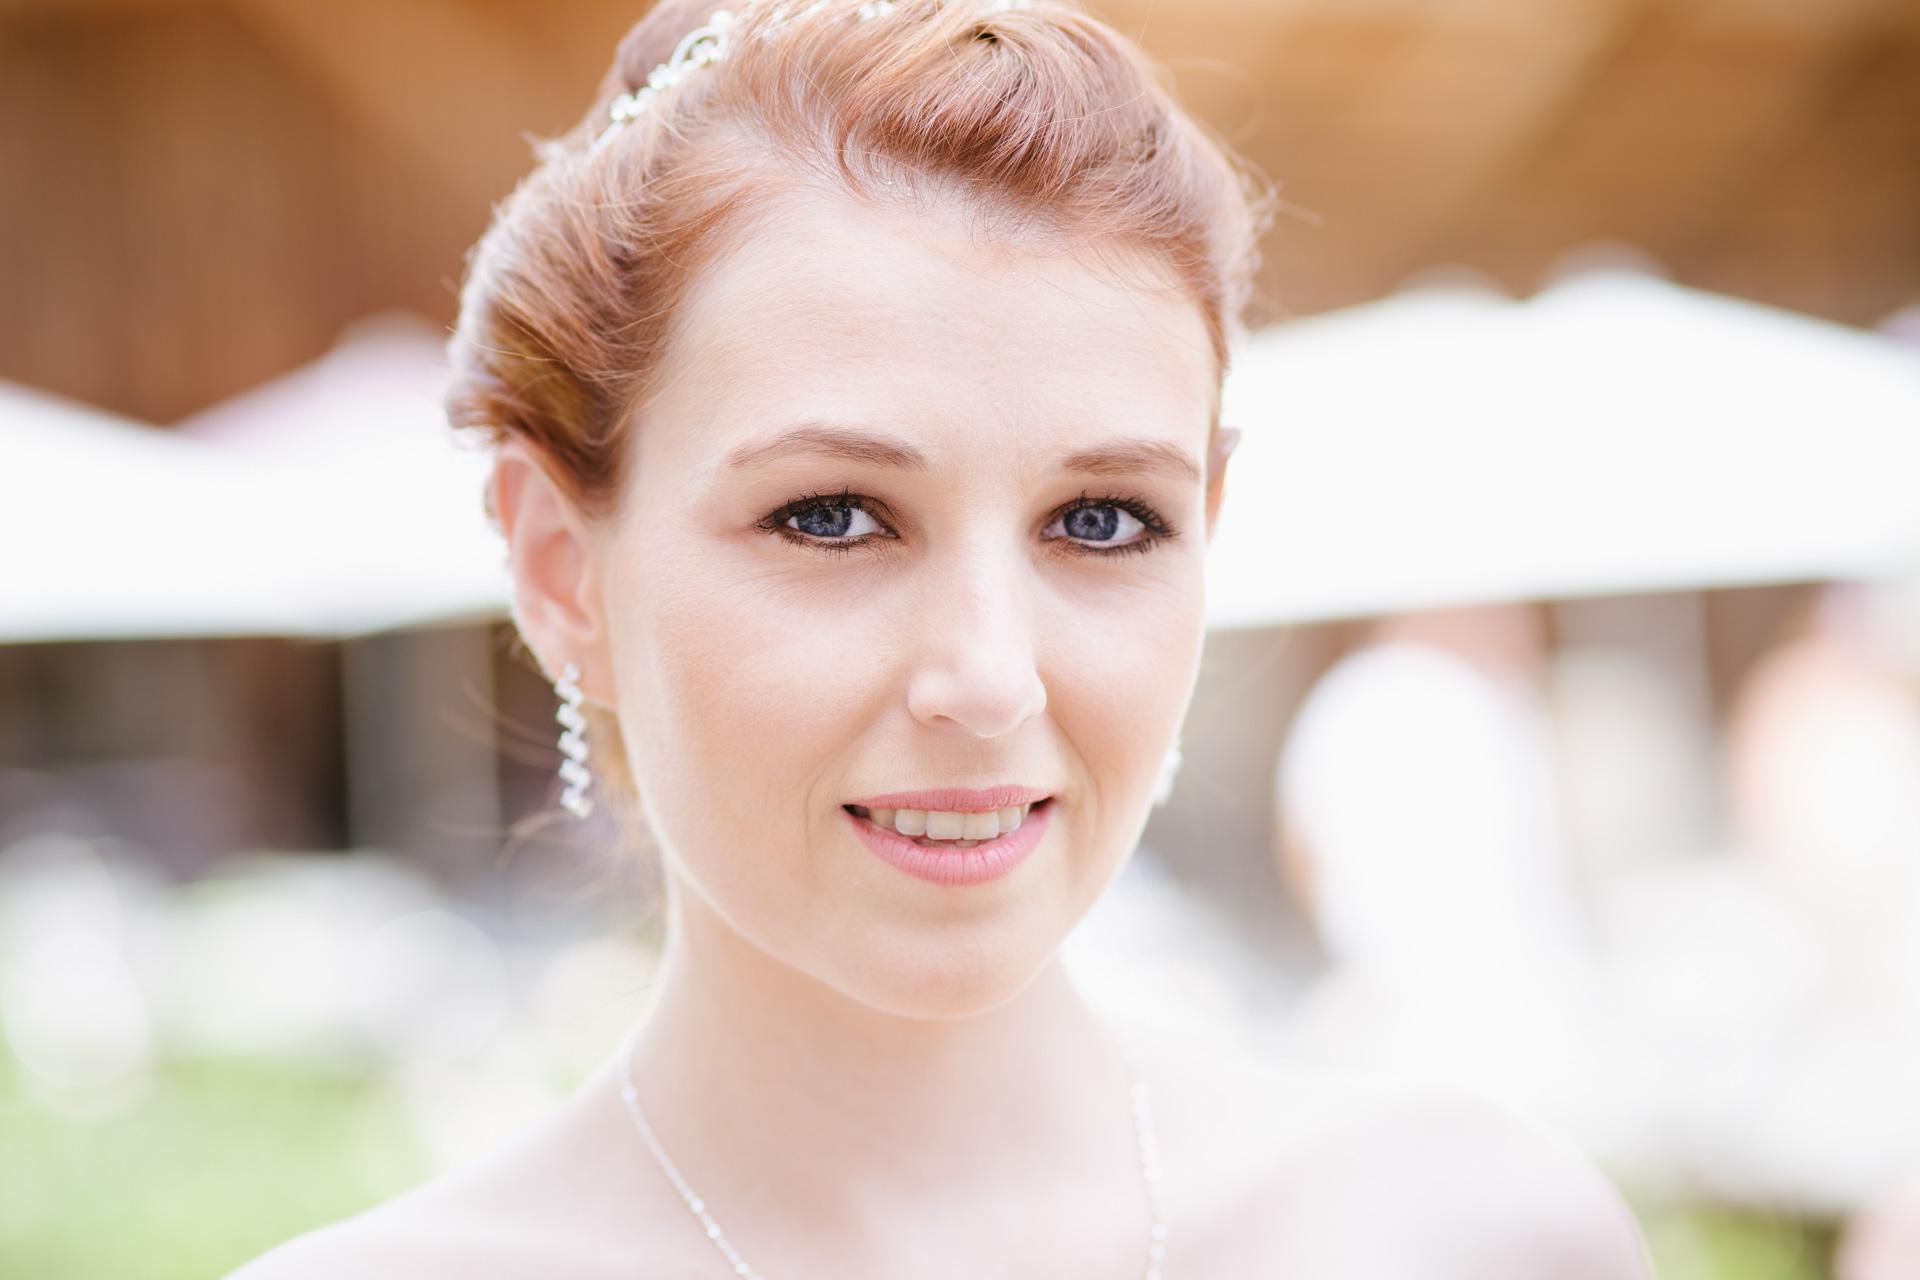 Pixelart_Hochzeitsfotografen_Loerrach_Rheinfelden_Hallwil_Schweiz_Linda-Ramon-1015